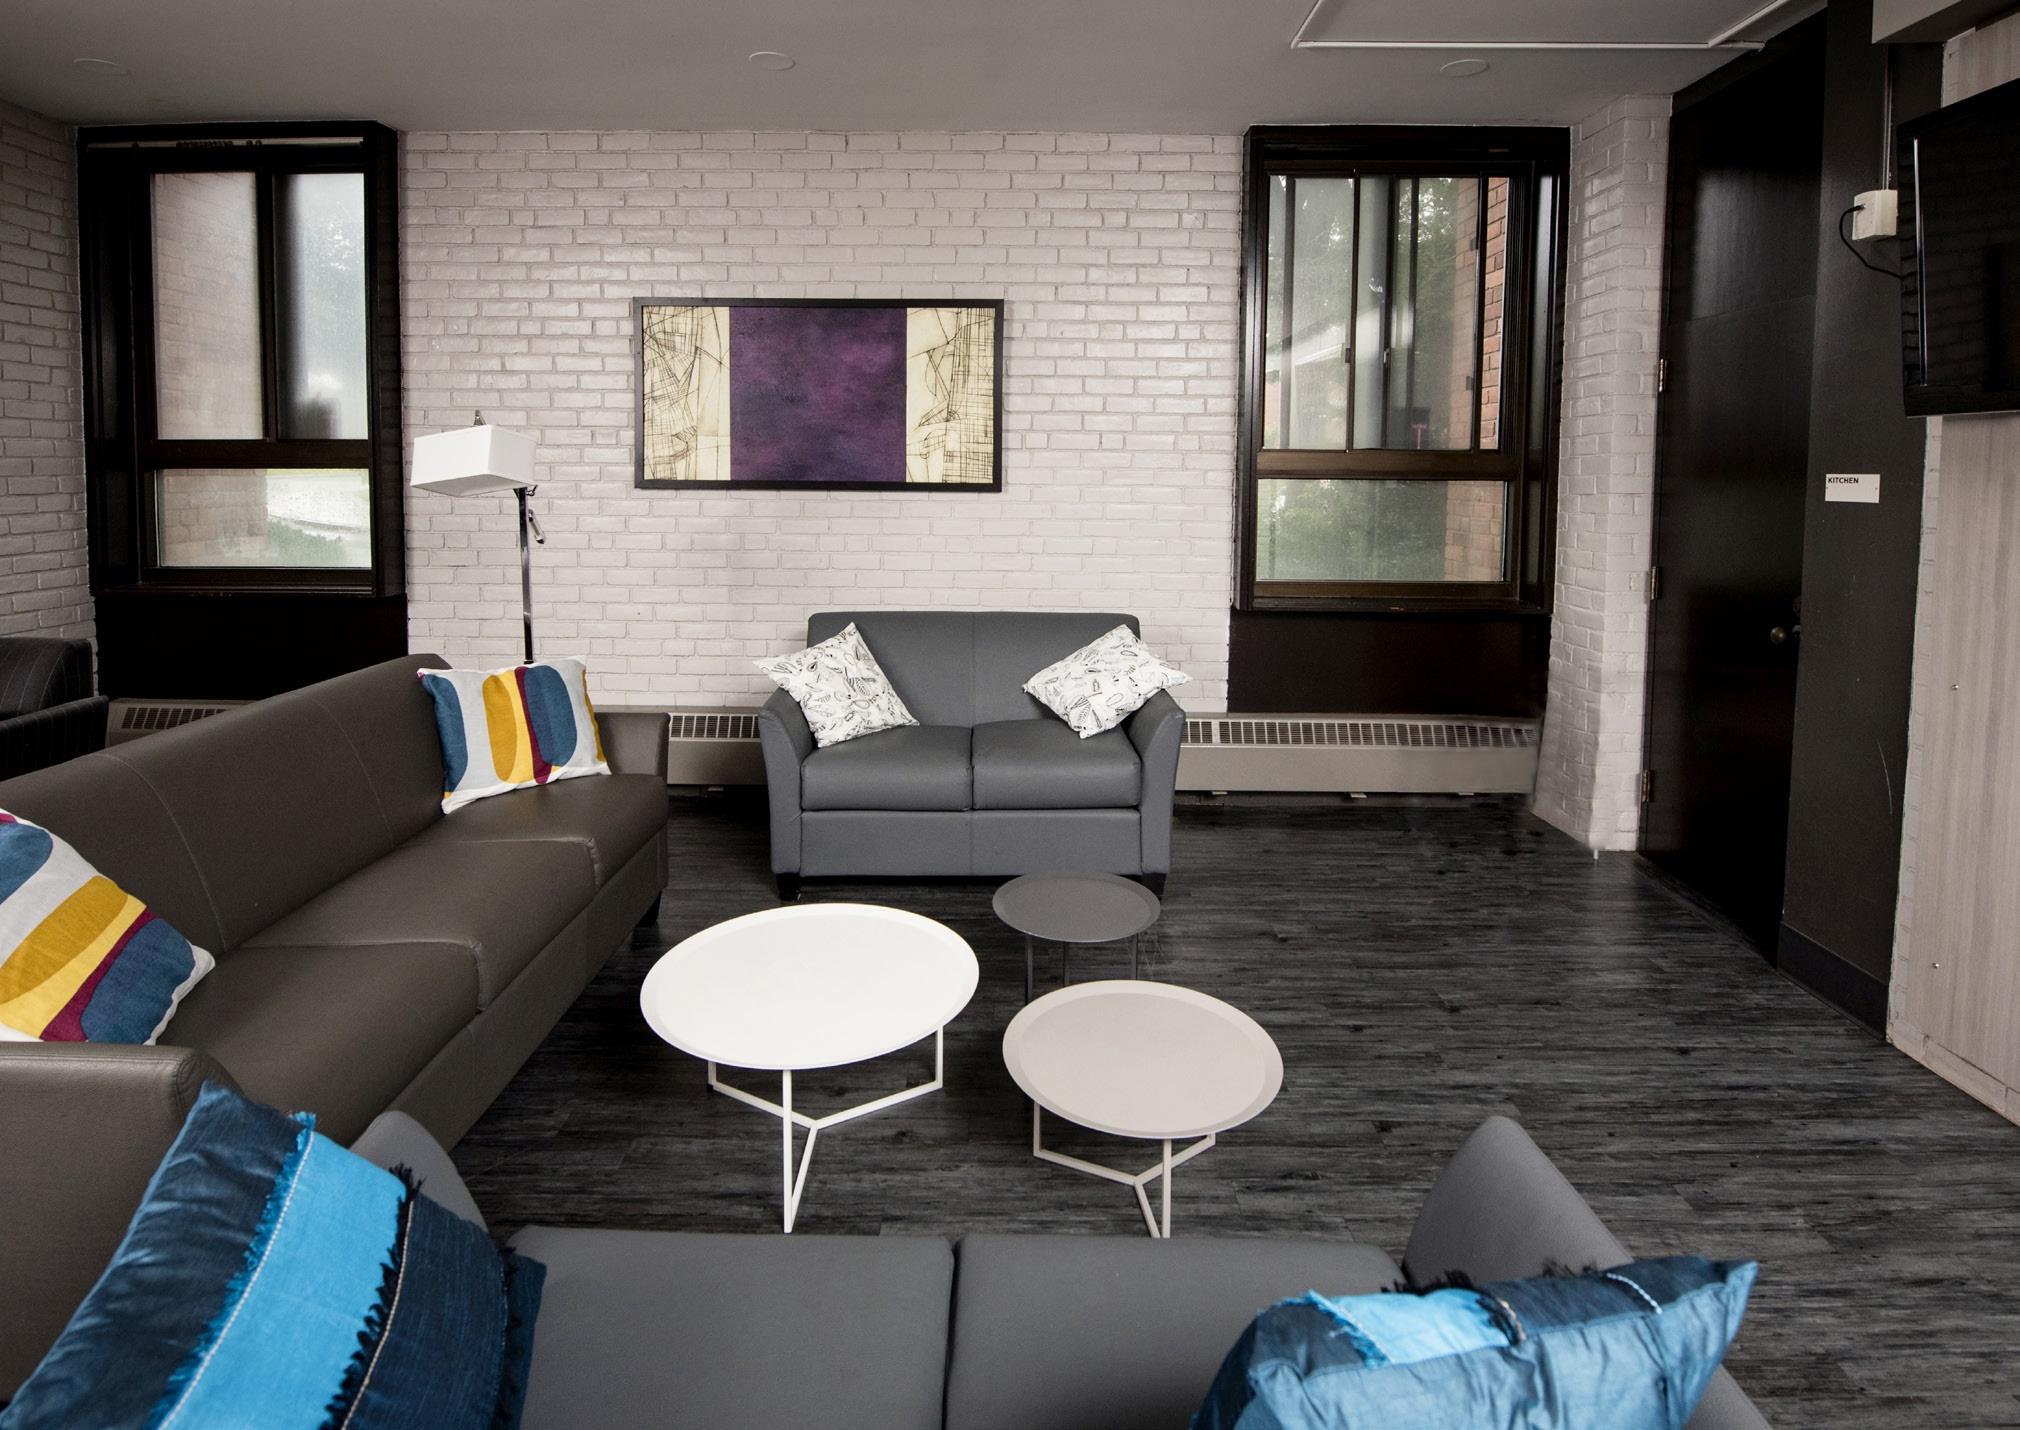 Haskell-Hall-Intern-Lounge-Tufts-University.jpg